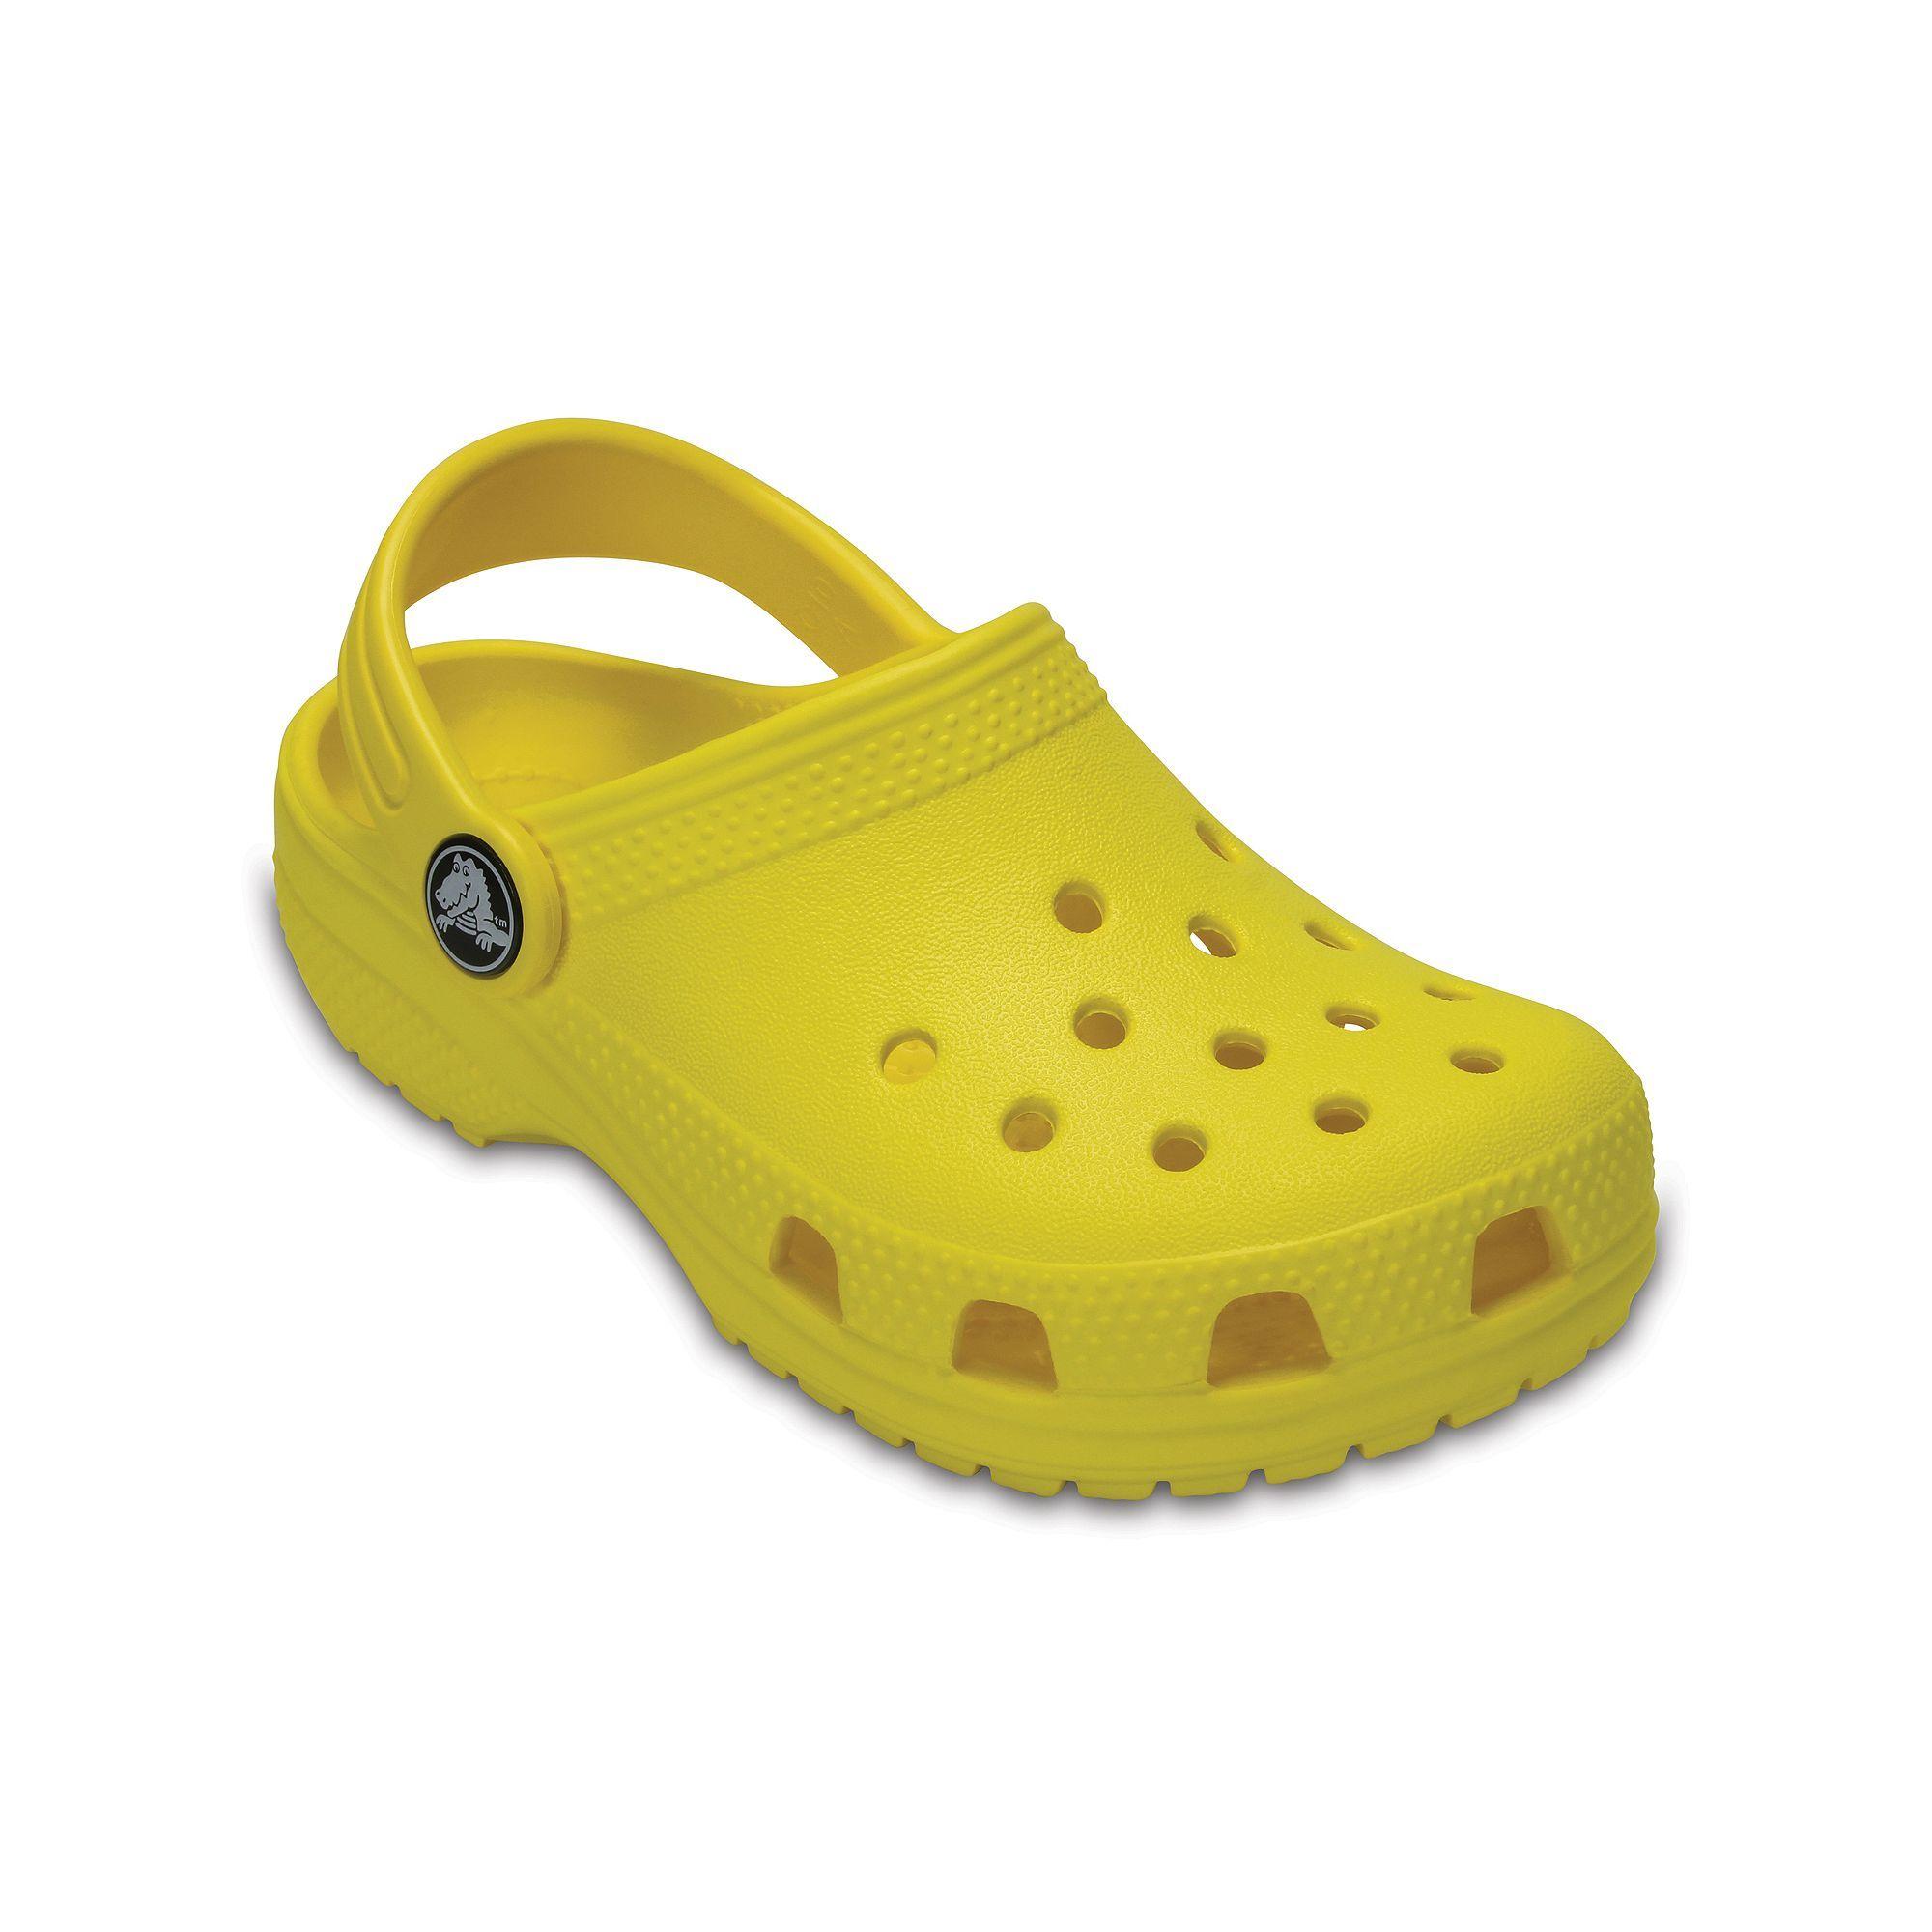 0a25d04b21765 Crocs Classic Kid s Clogs